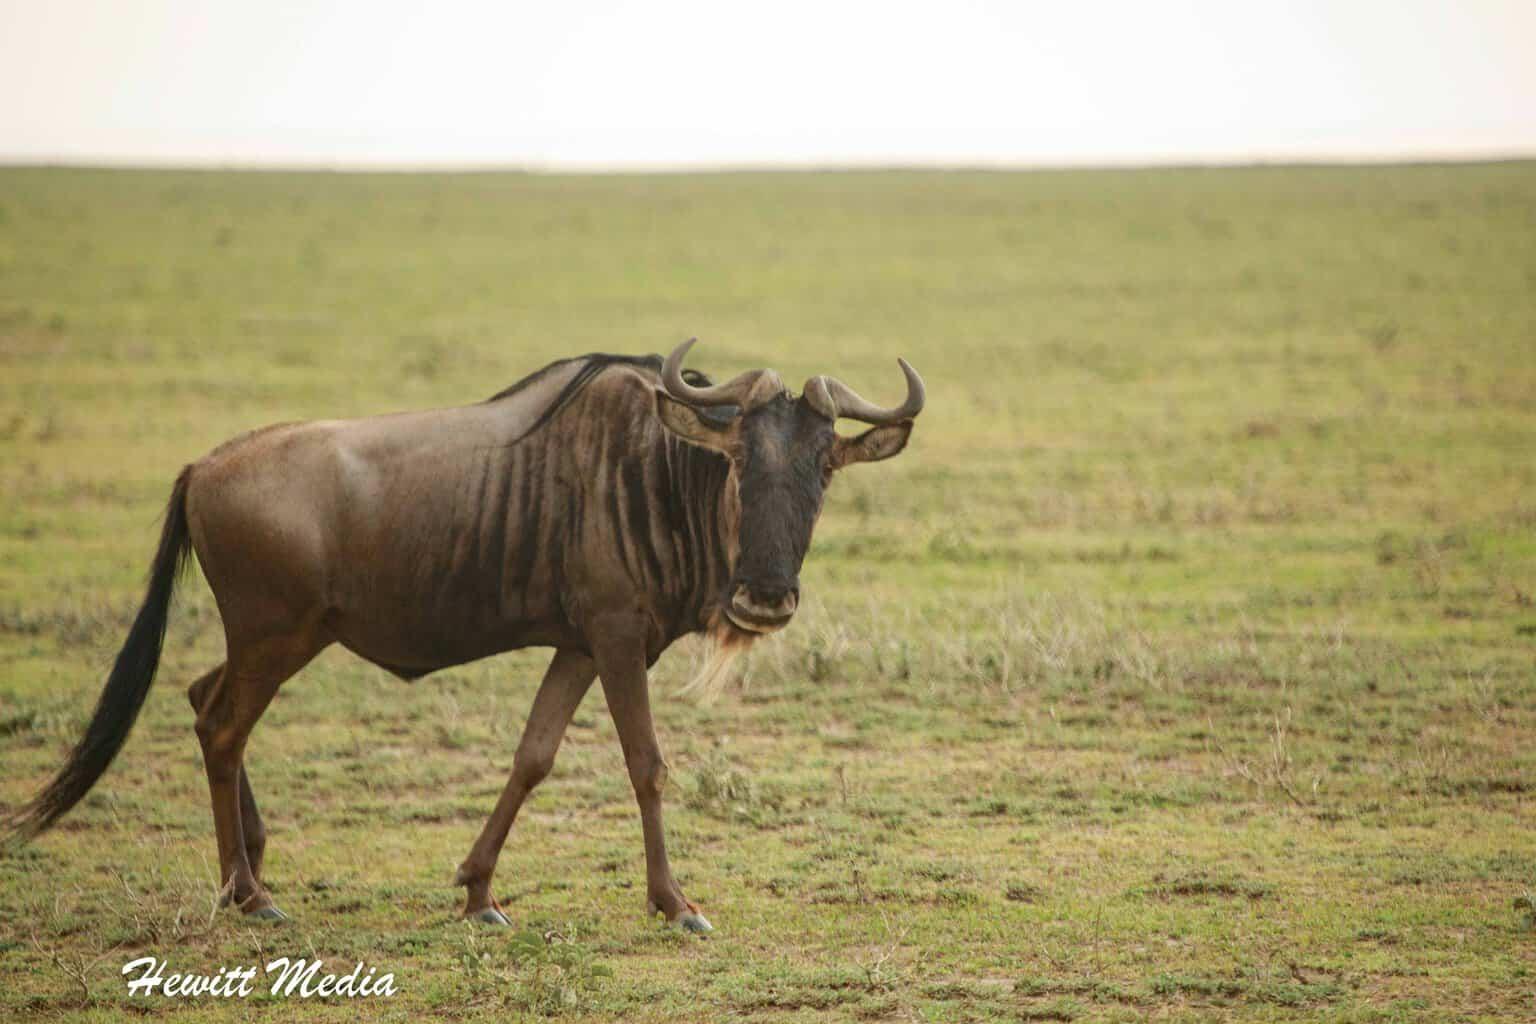 Wildebeest in the Serengeti National Park